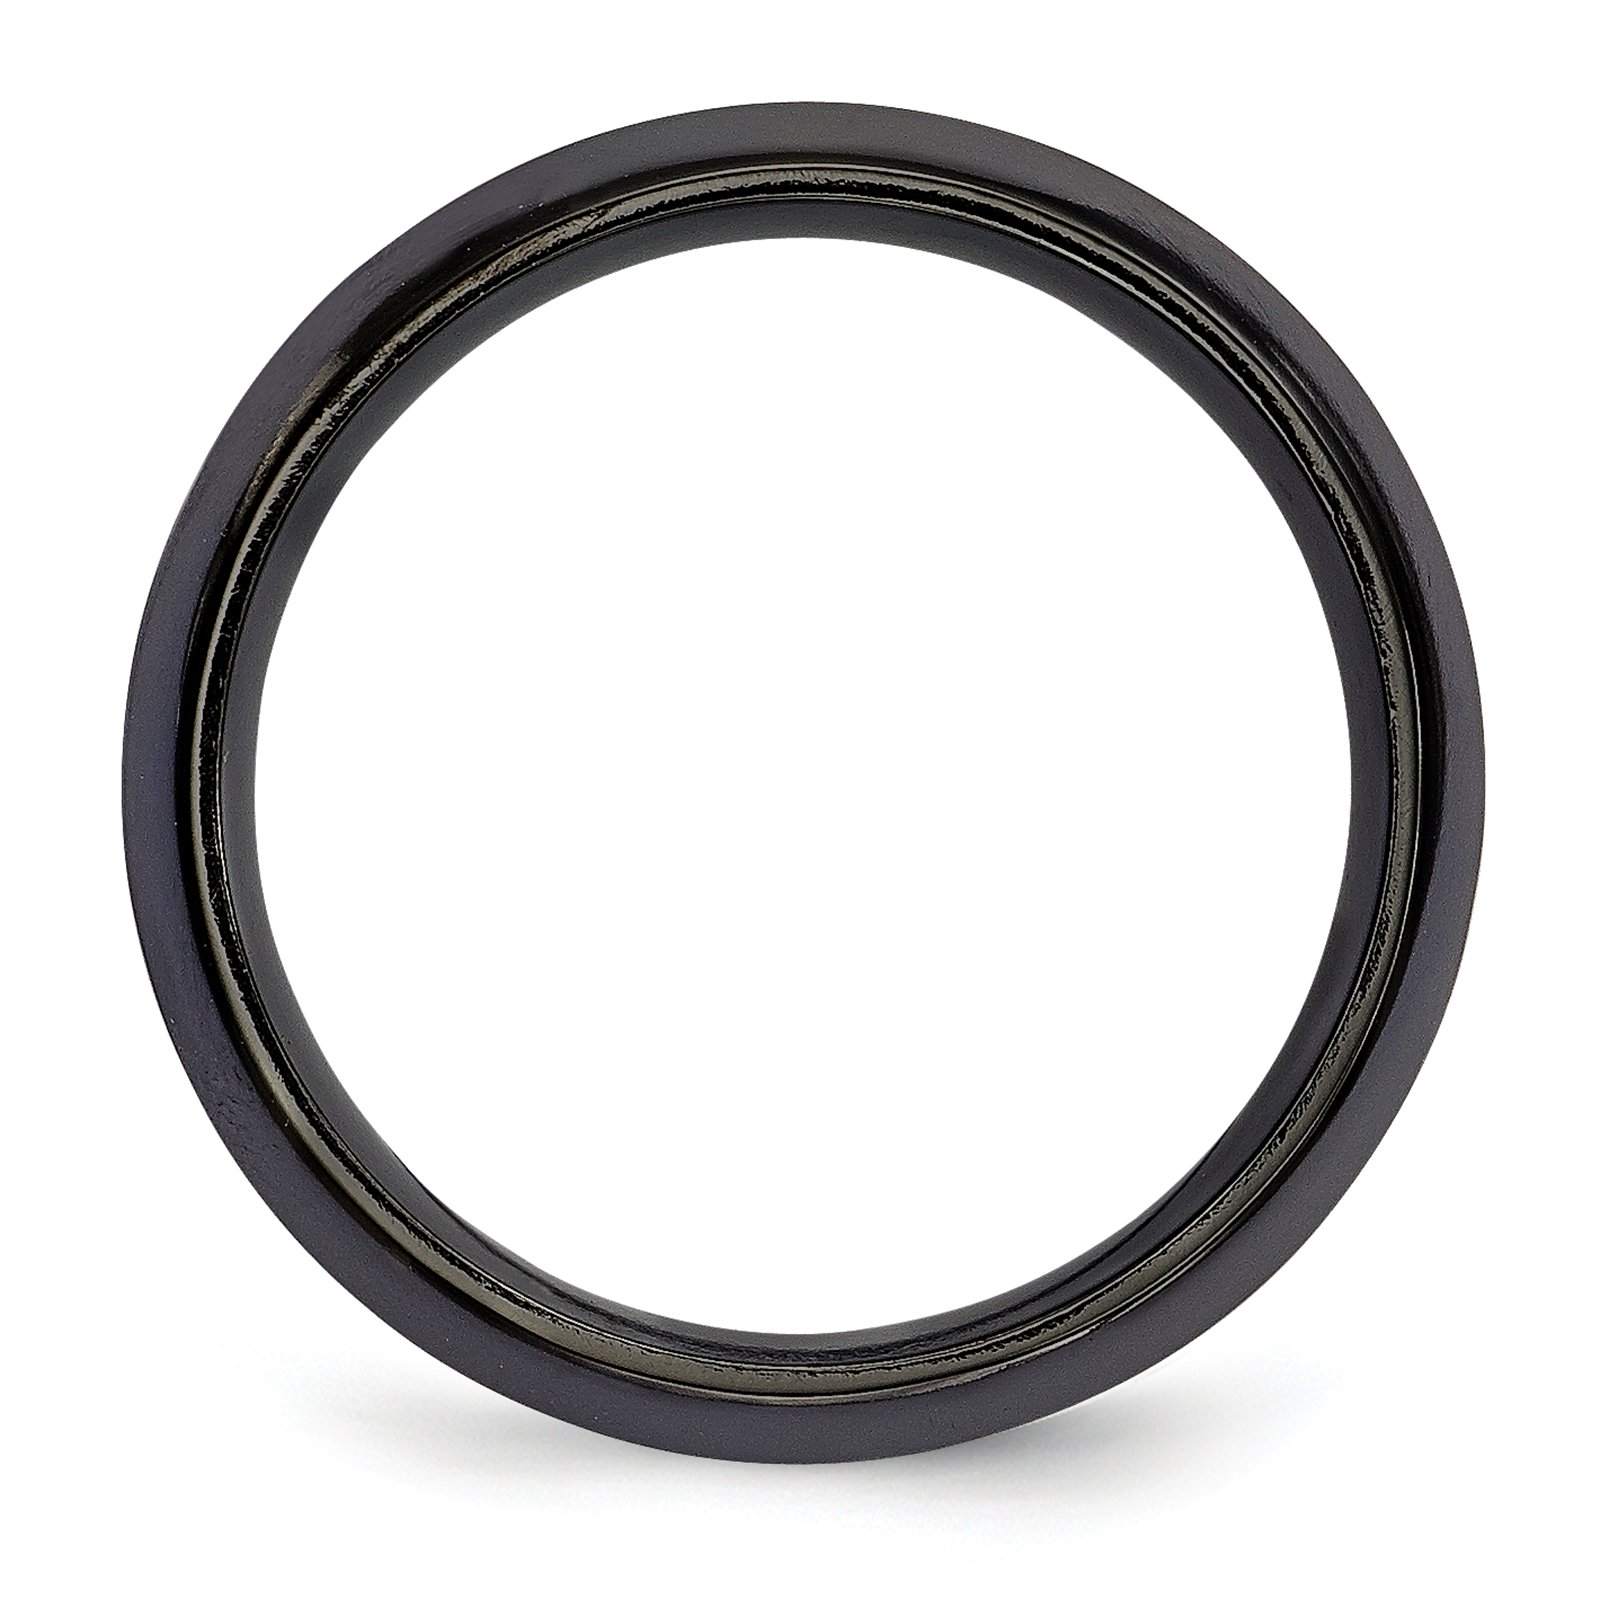 Titanium Black Ti w/Sterling Silver Inlay Celtic Design 9mm Wedding Band Size 10.5 by Edward Mirell by Venture Edward Mirell Titanium Bands (Image #2)